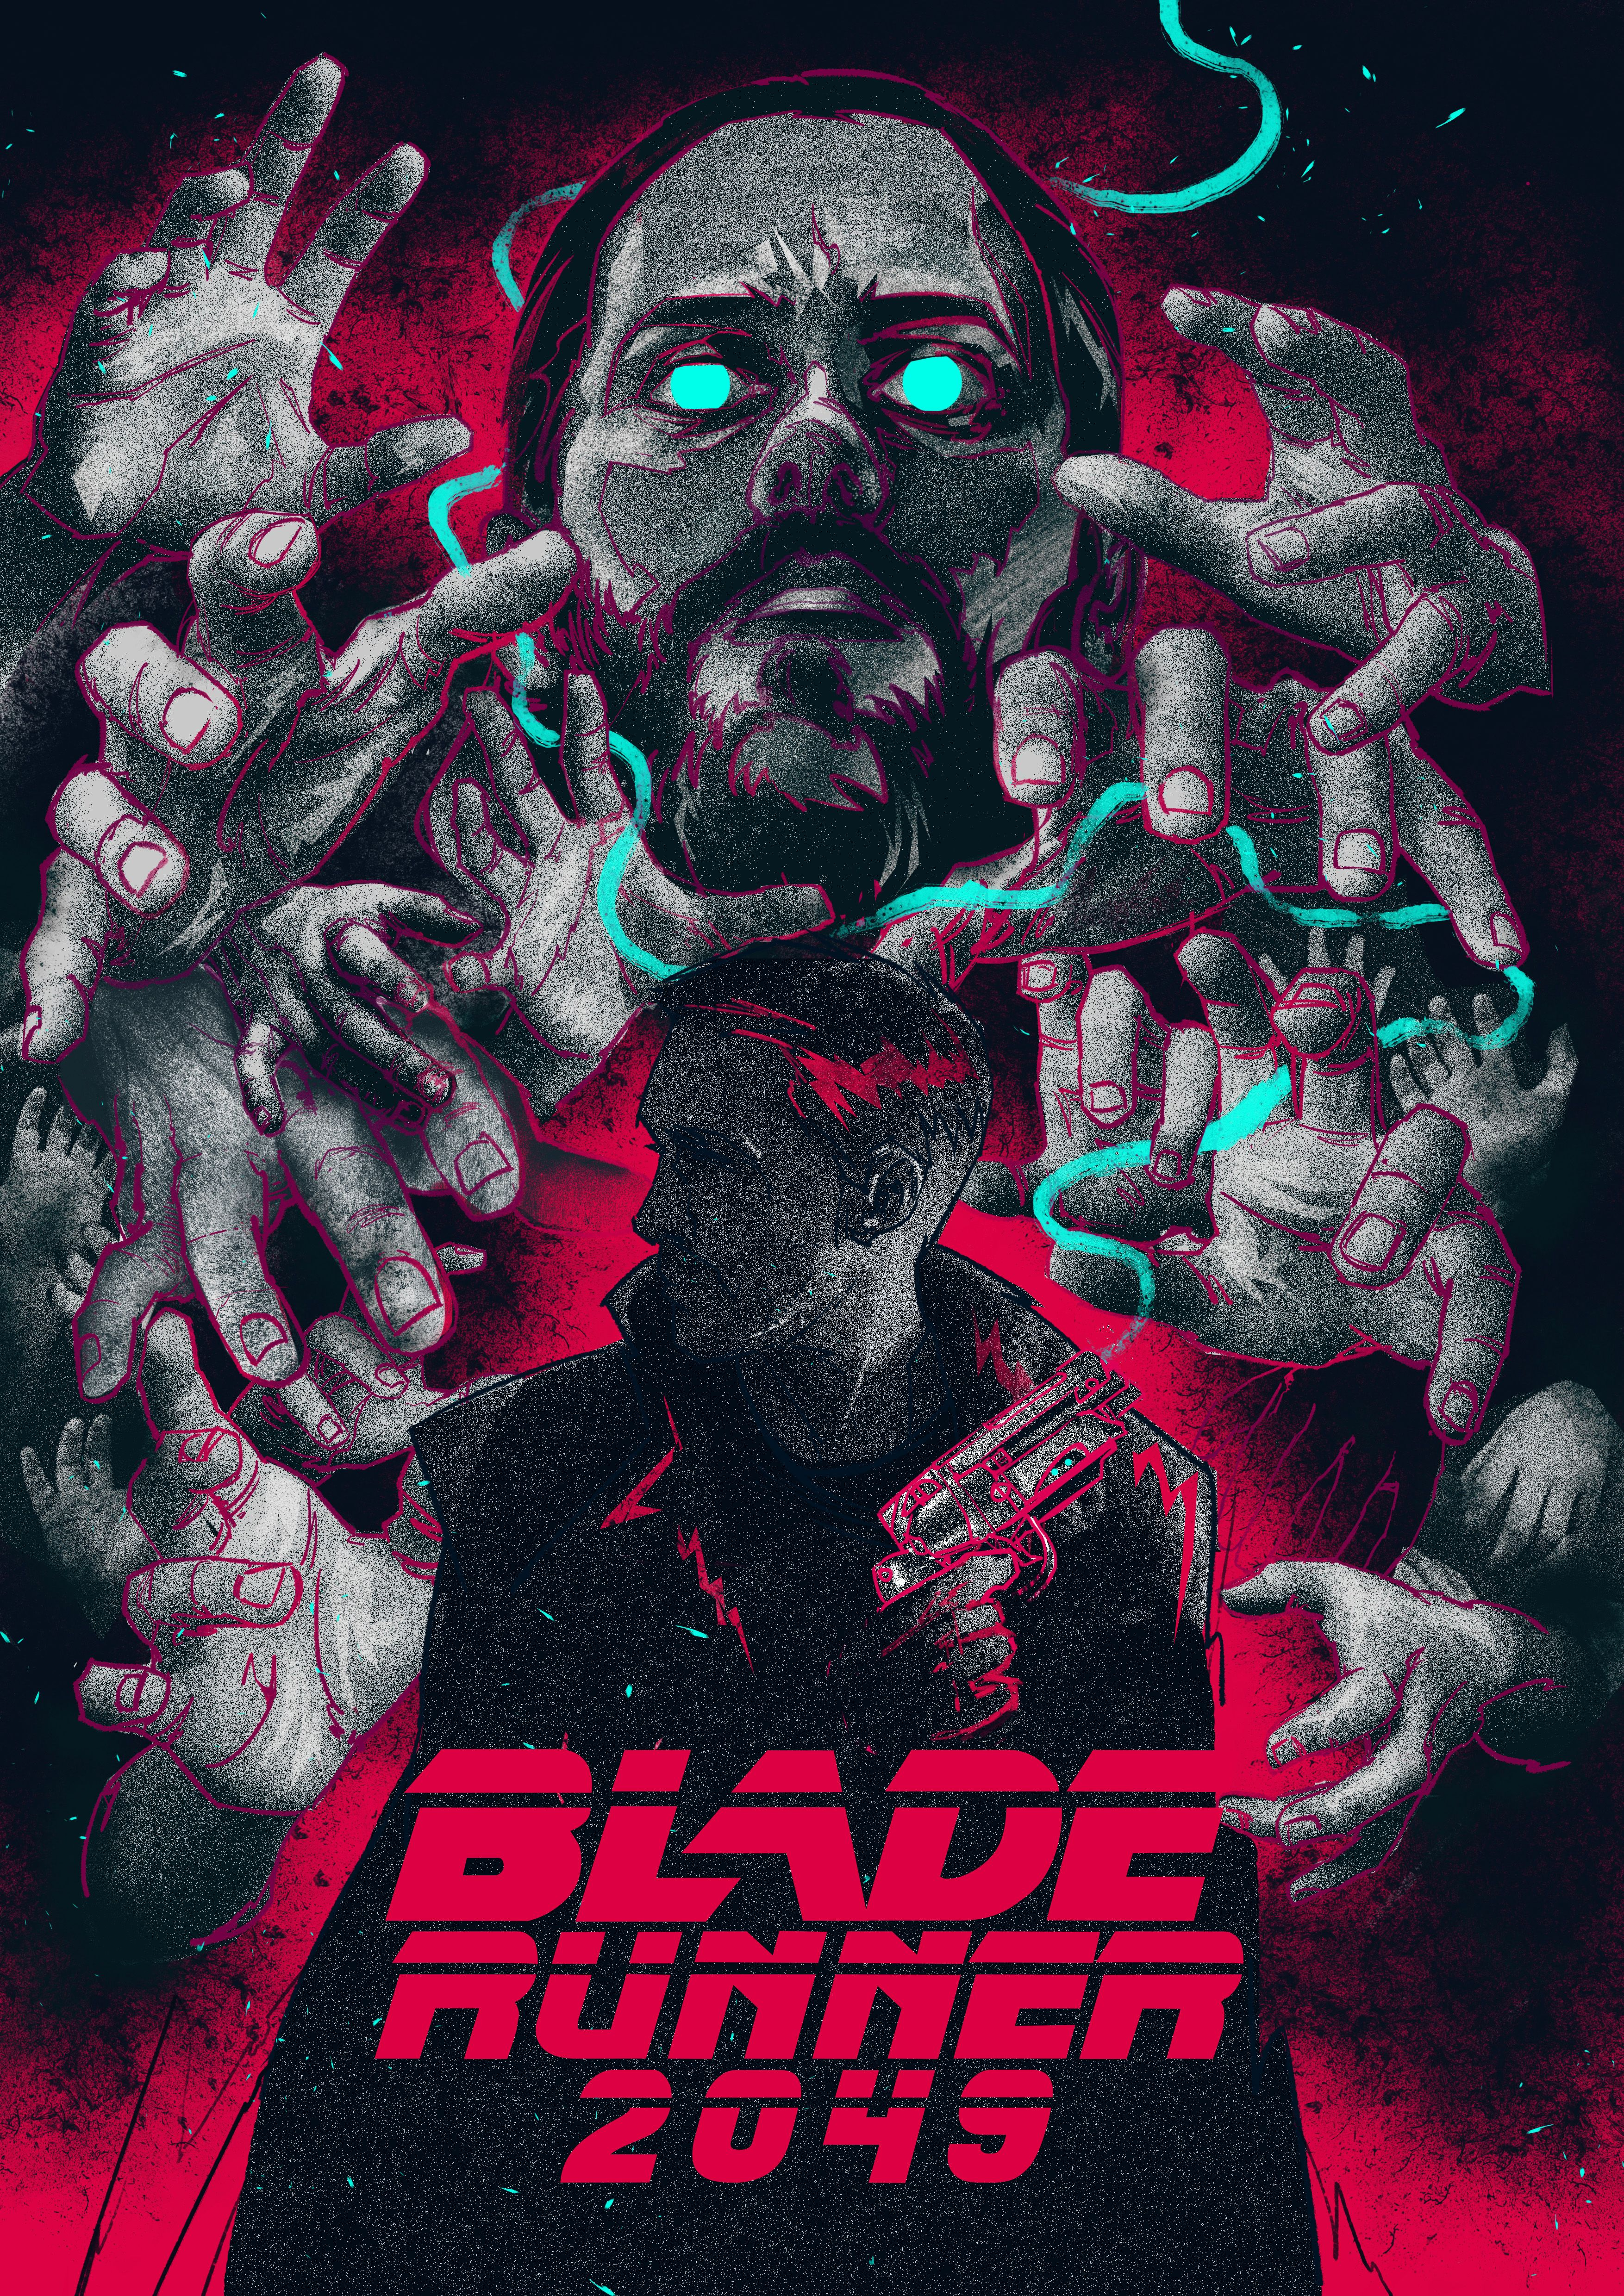 Blade Runner 2049 Bigtoe142 Hotmail Com Blade Runner Art Blade Runner Movie Poster Art